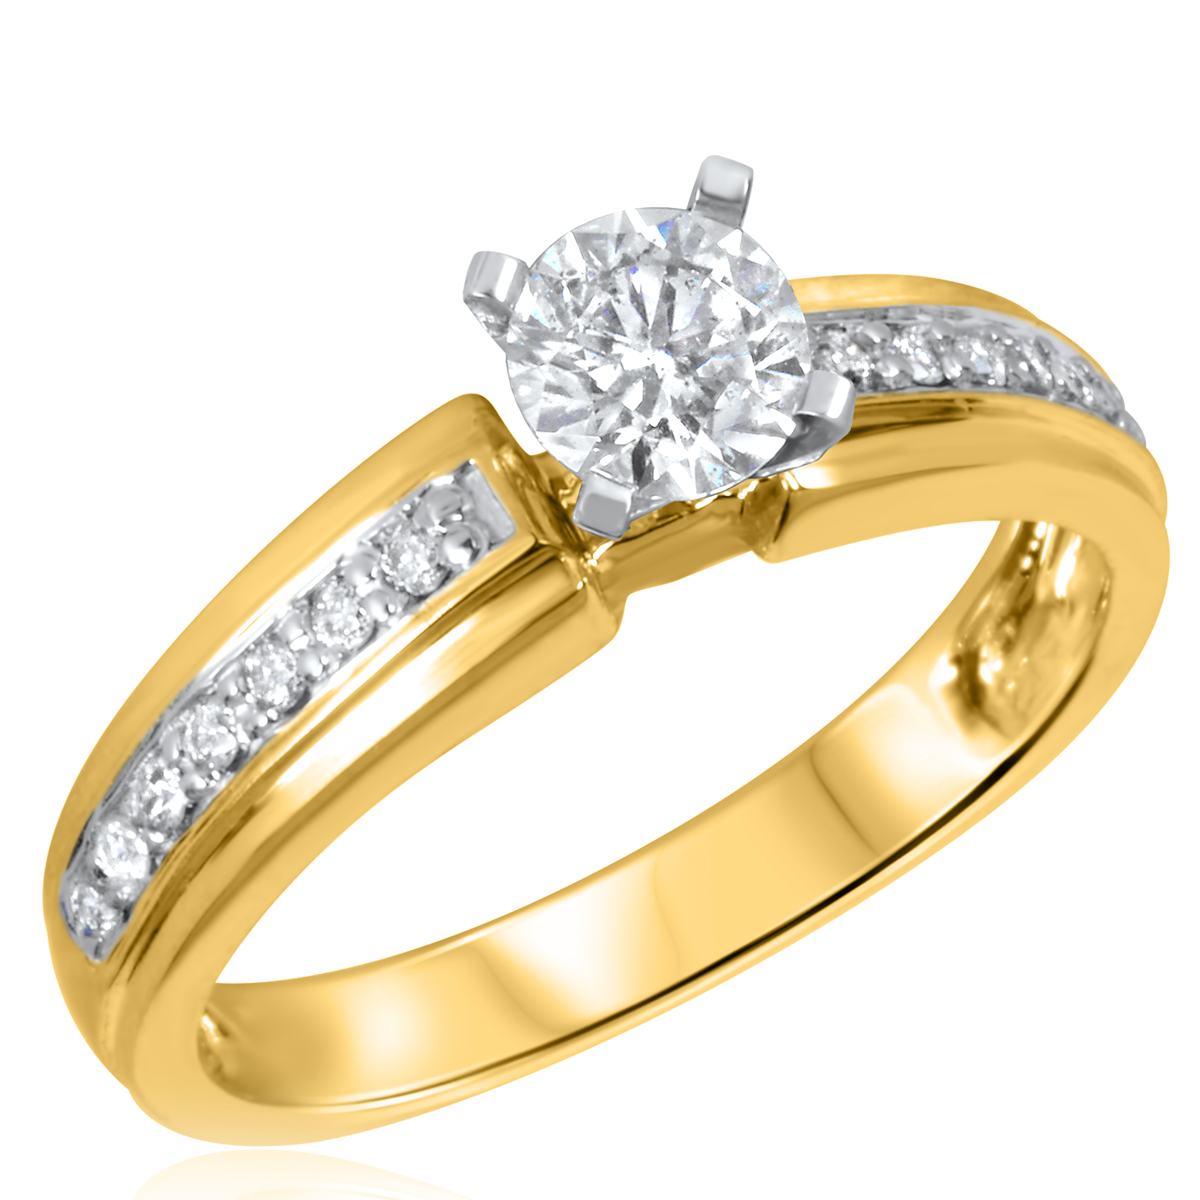 2/3 CT. T.W. Diamond Ladies Engagement Ring 14K Yellow Gold- Size 8